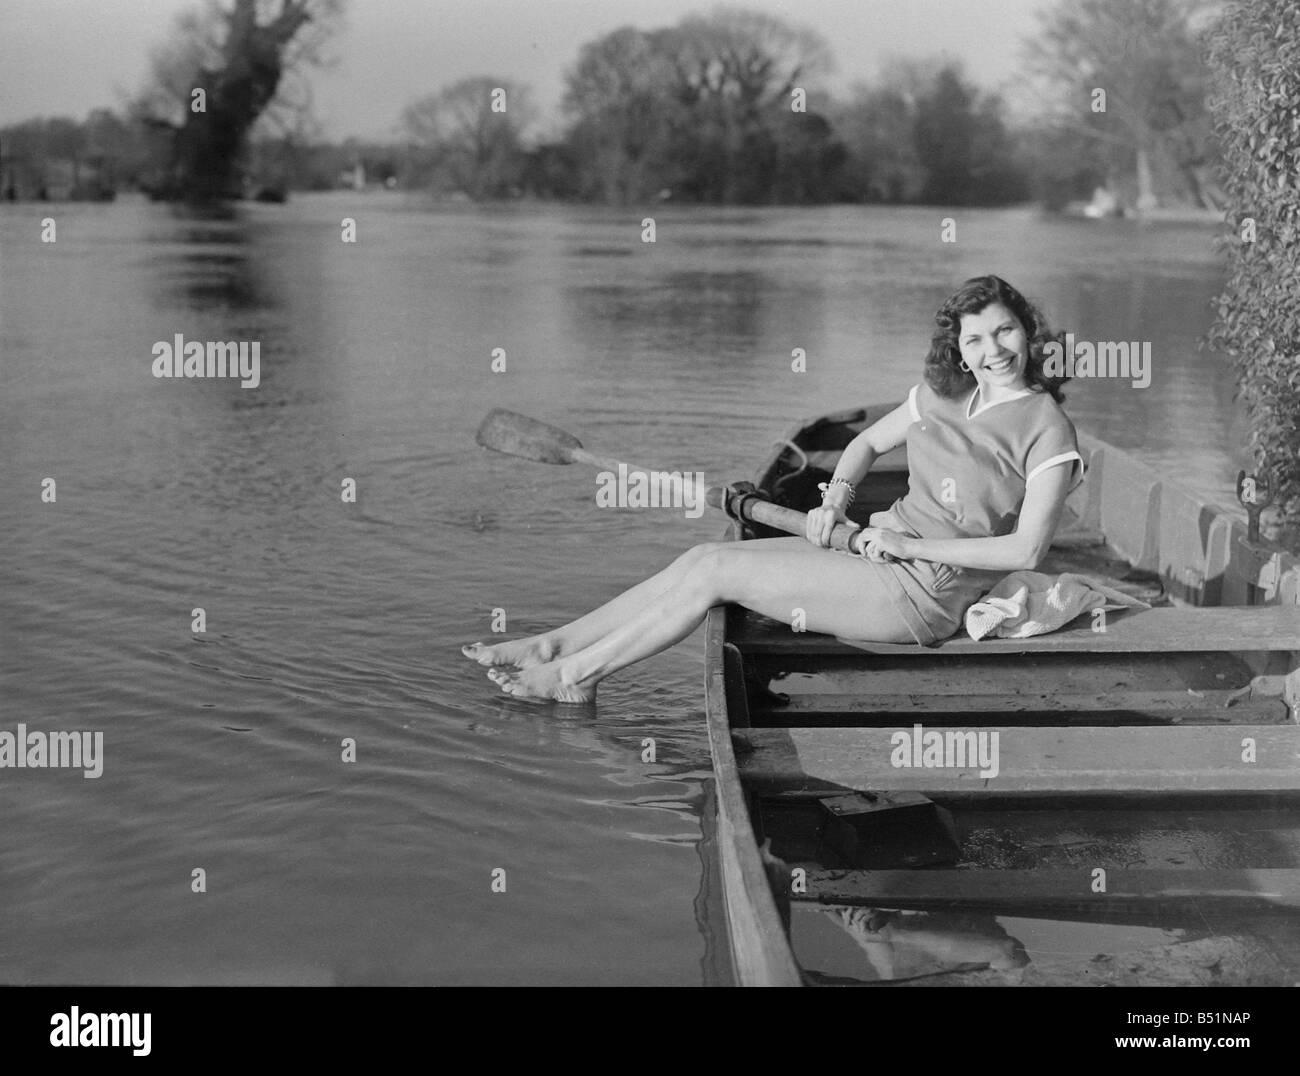 Simone Silver rowing on riverSP 15/4/1951B1743/51 - Stock Image